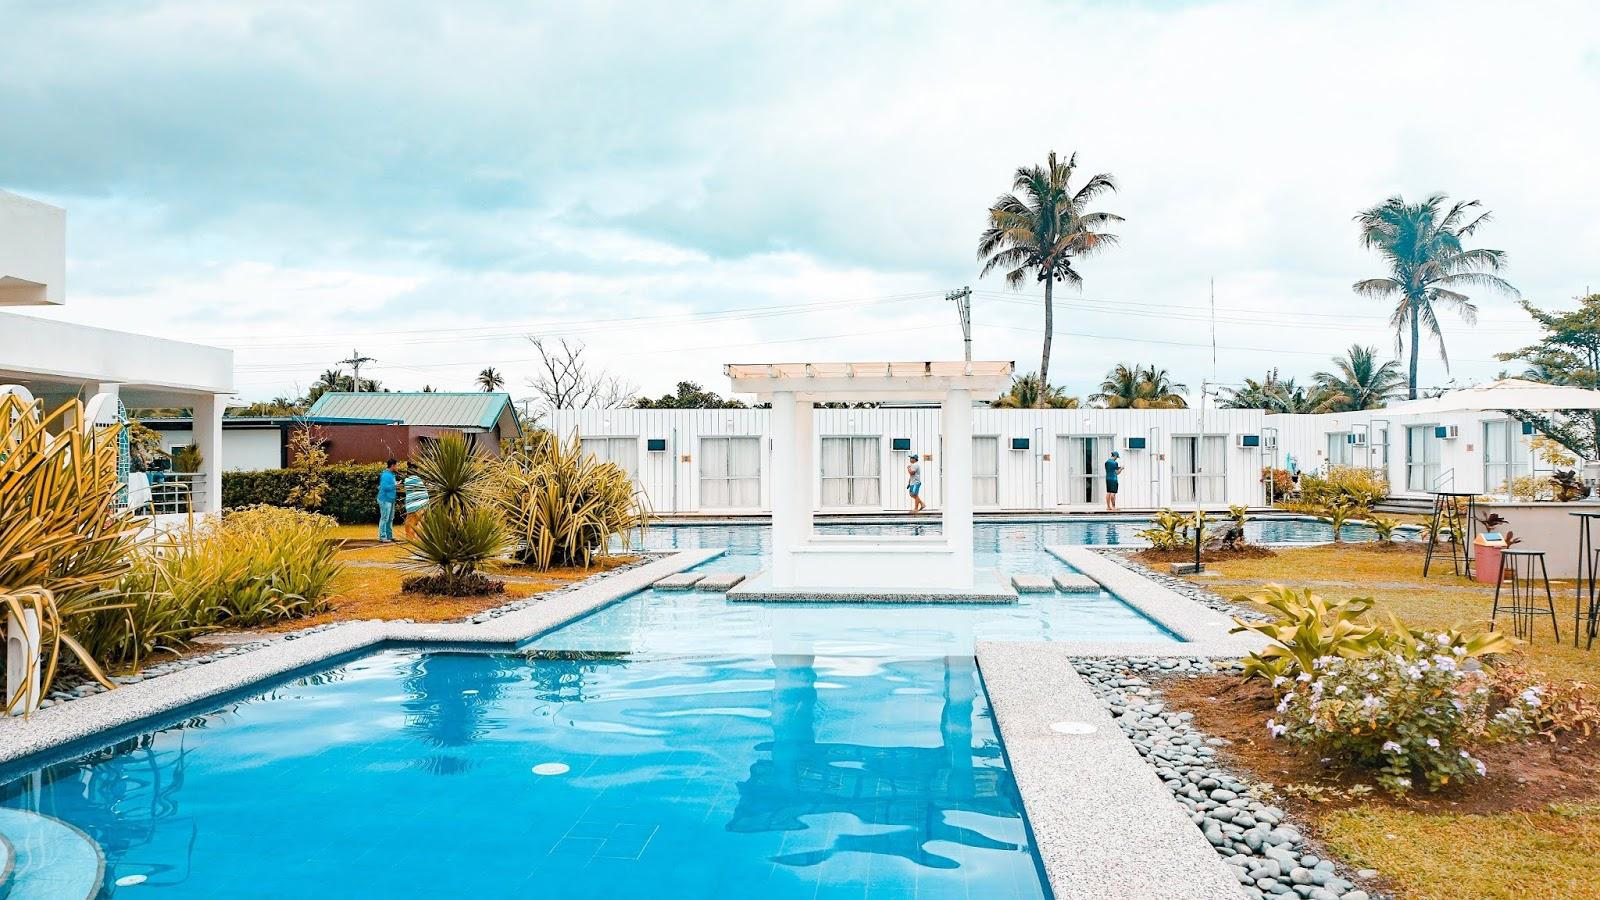 Resort with swimming pool in Baler, Aurora